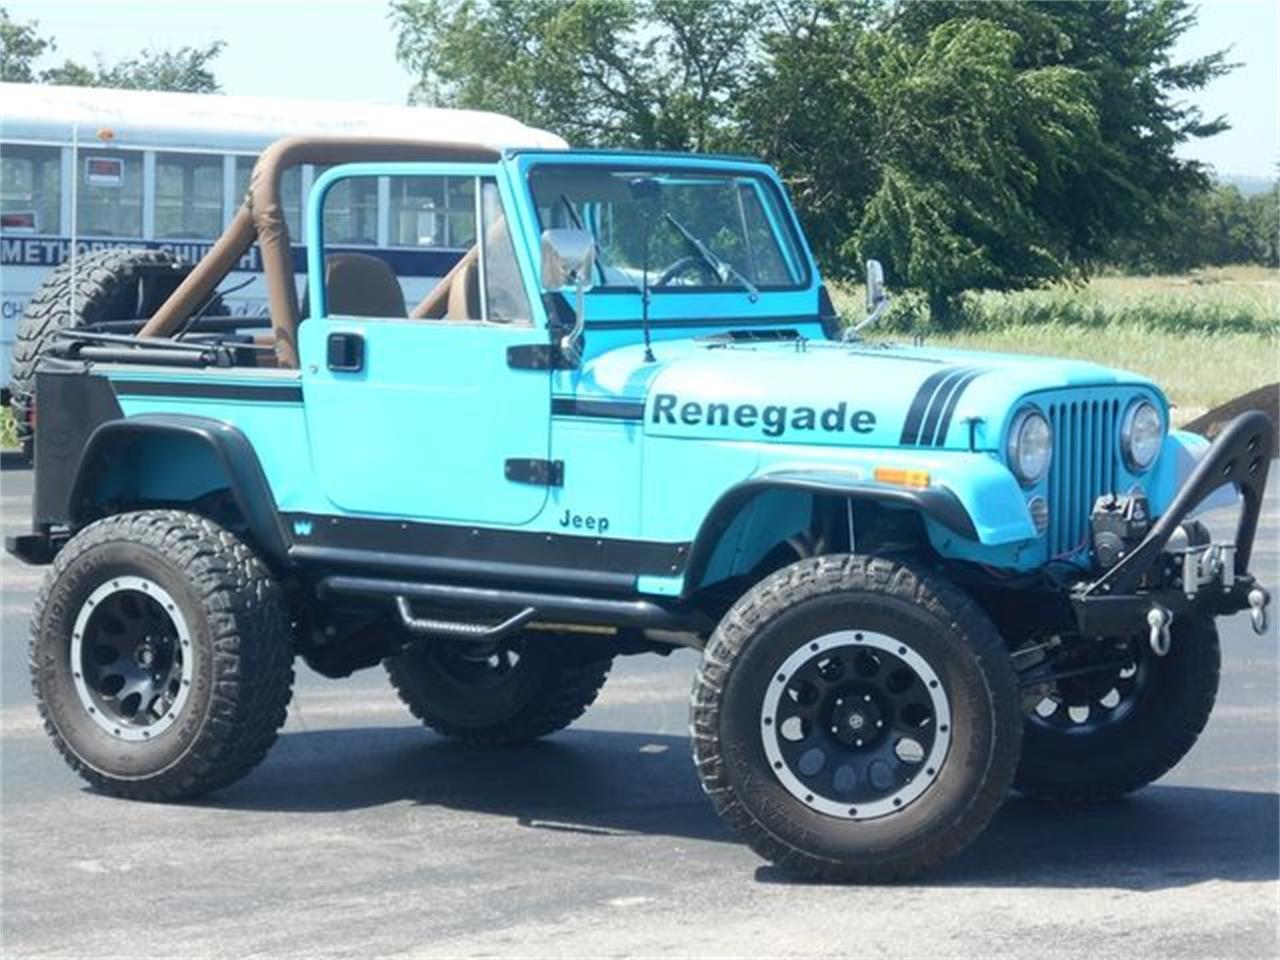 Cj7 Jeep For Sale >> For Sale 1980 Jeep Cj7 In Blanchard Oklahoma